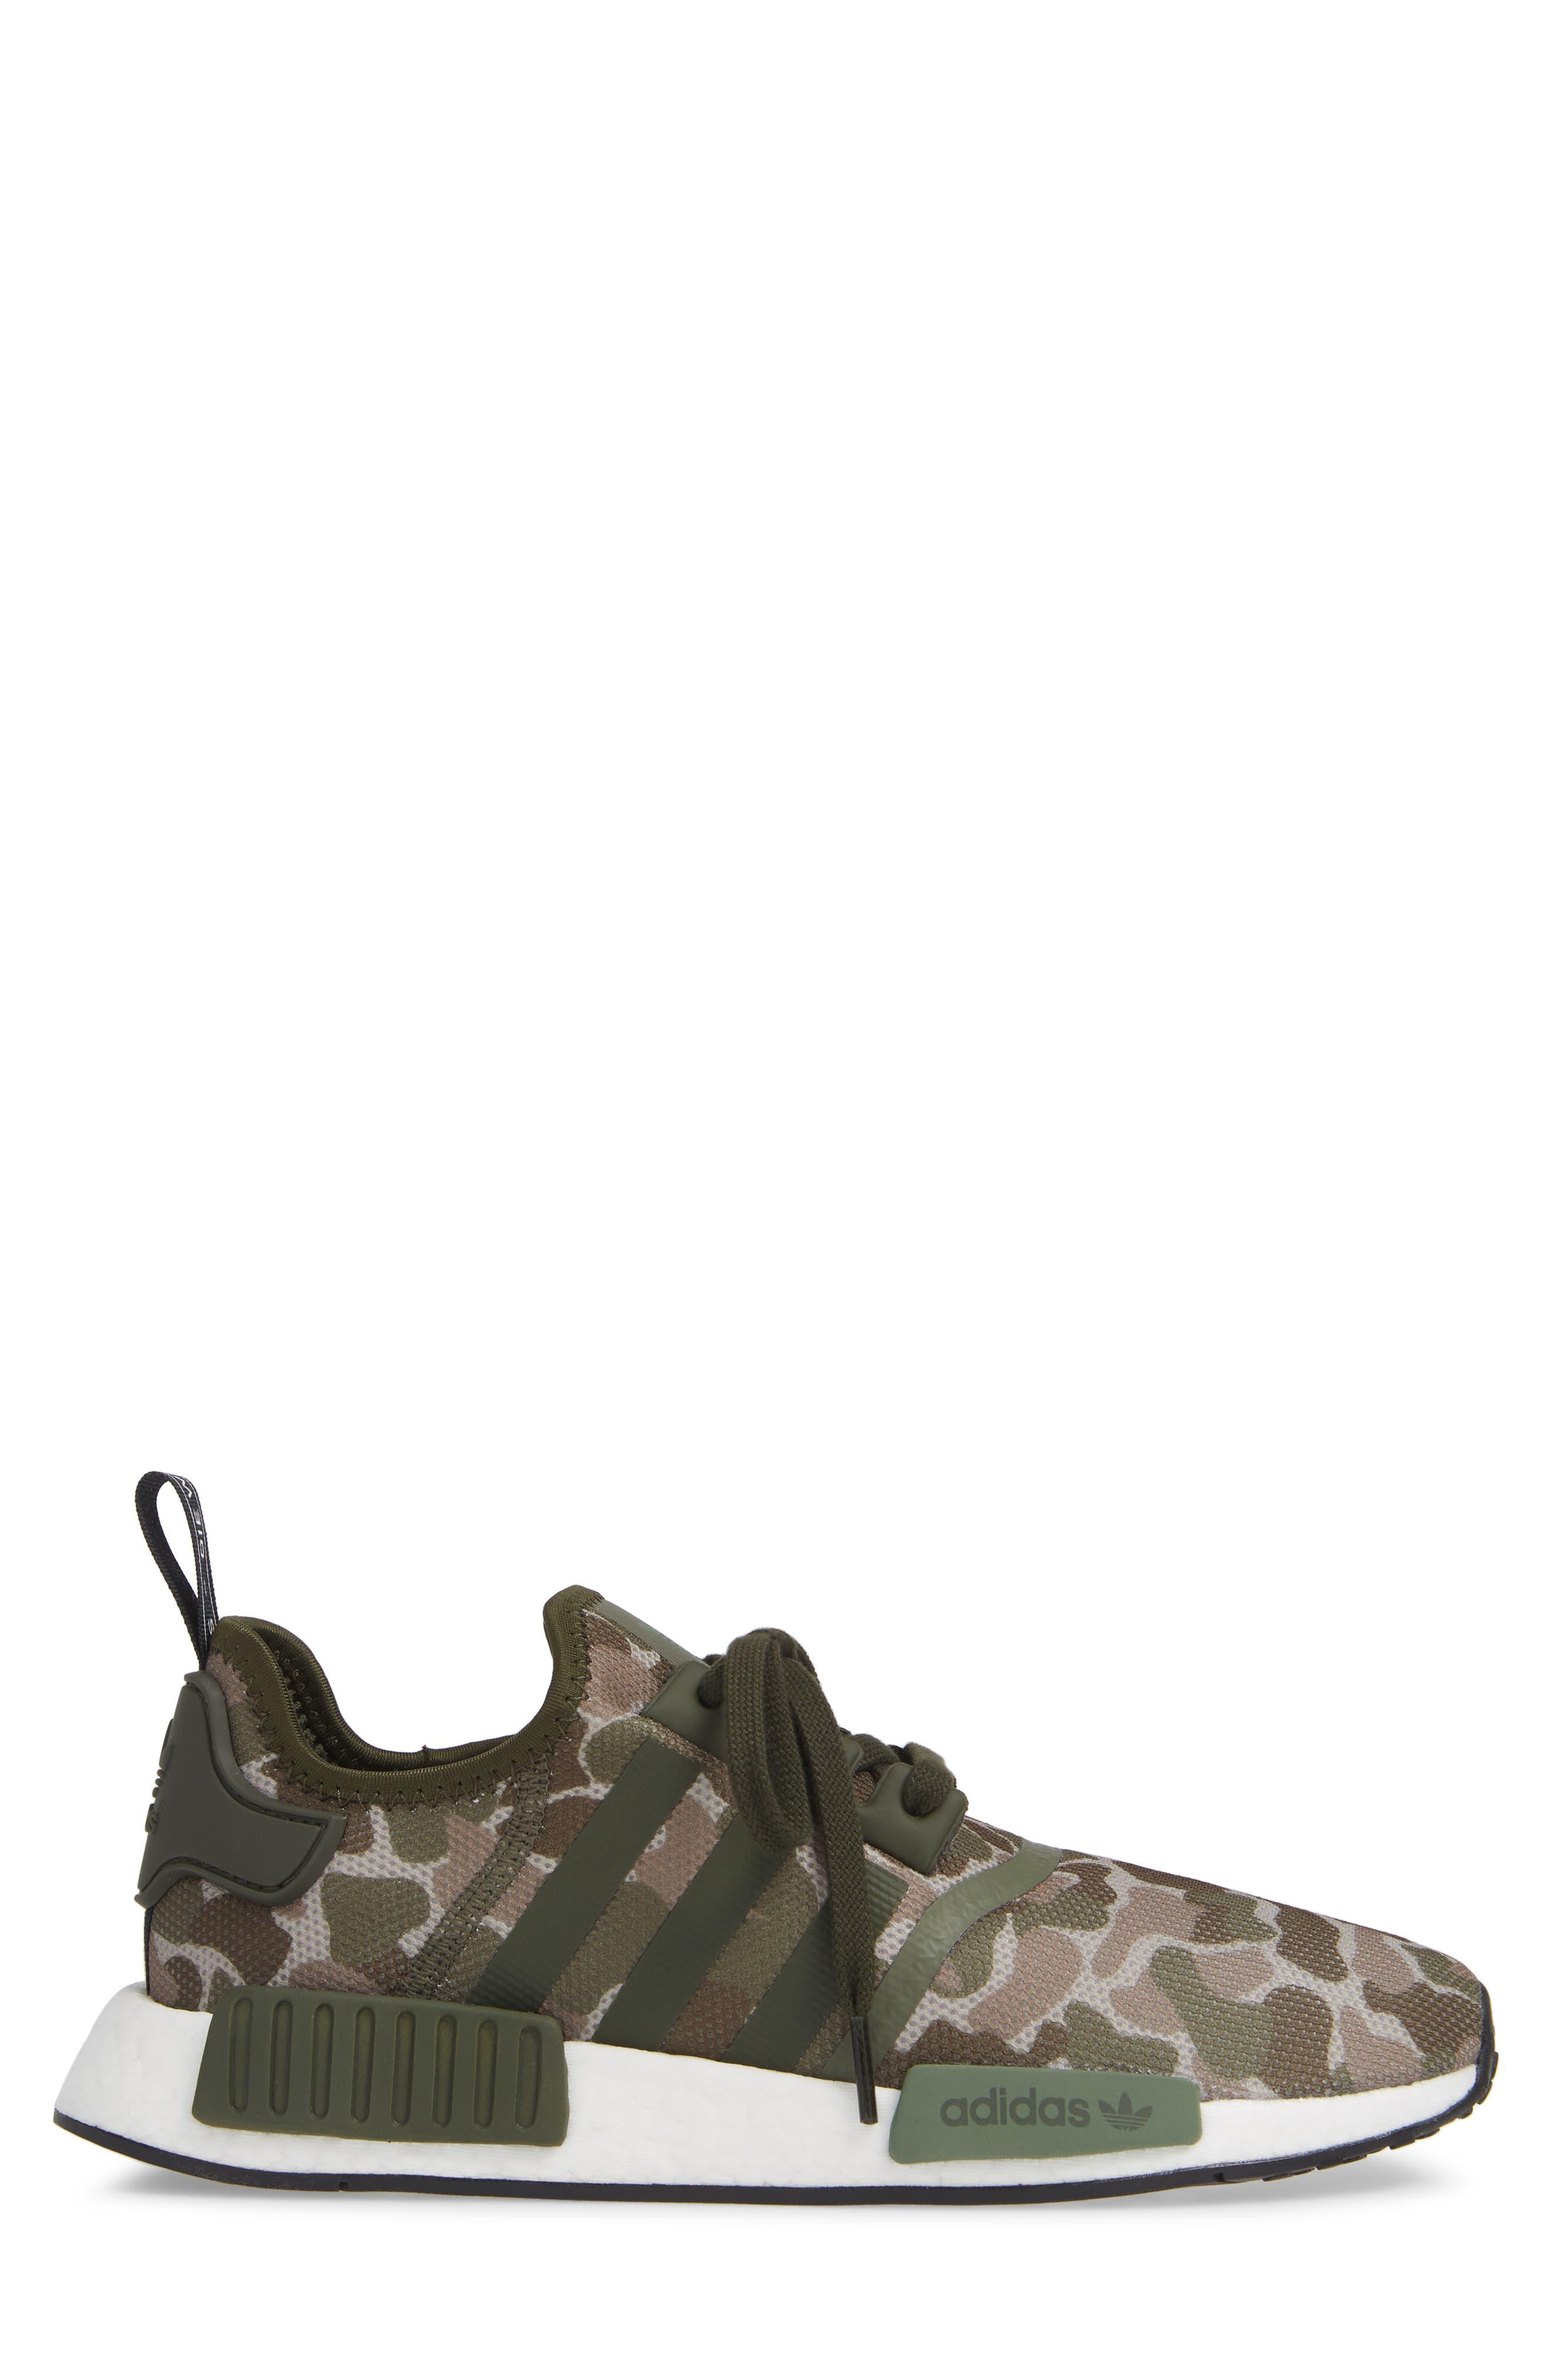 NMD R1 Camo Sneaker,                             Alternate thumbnail 3, color,                             305